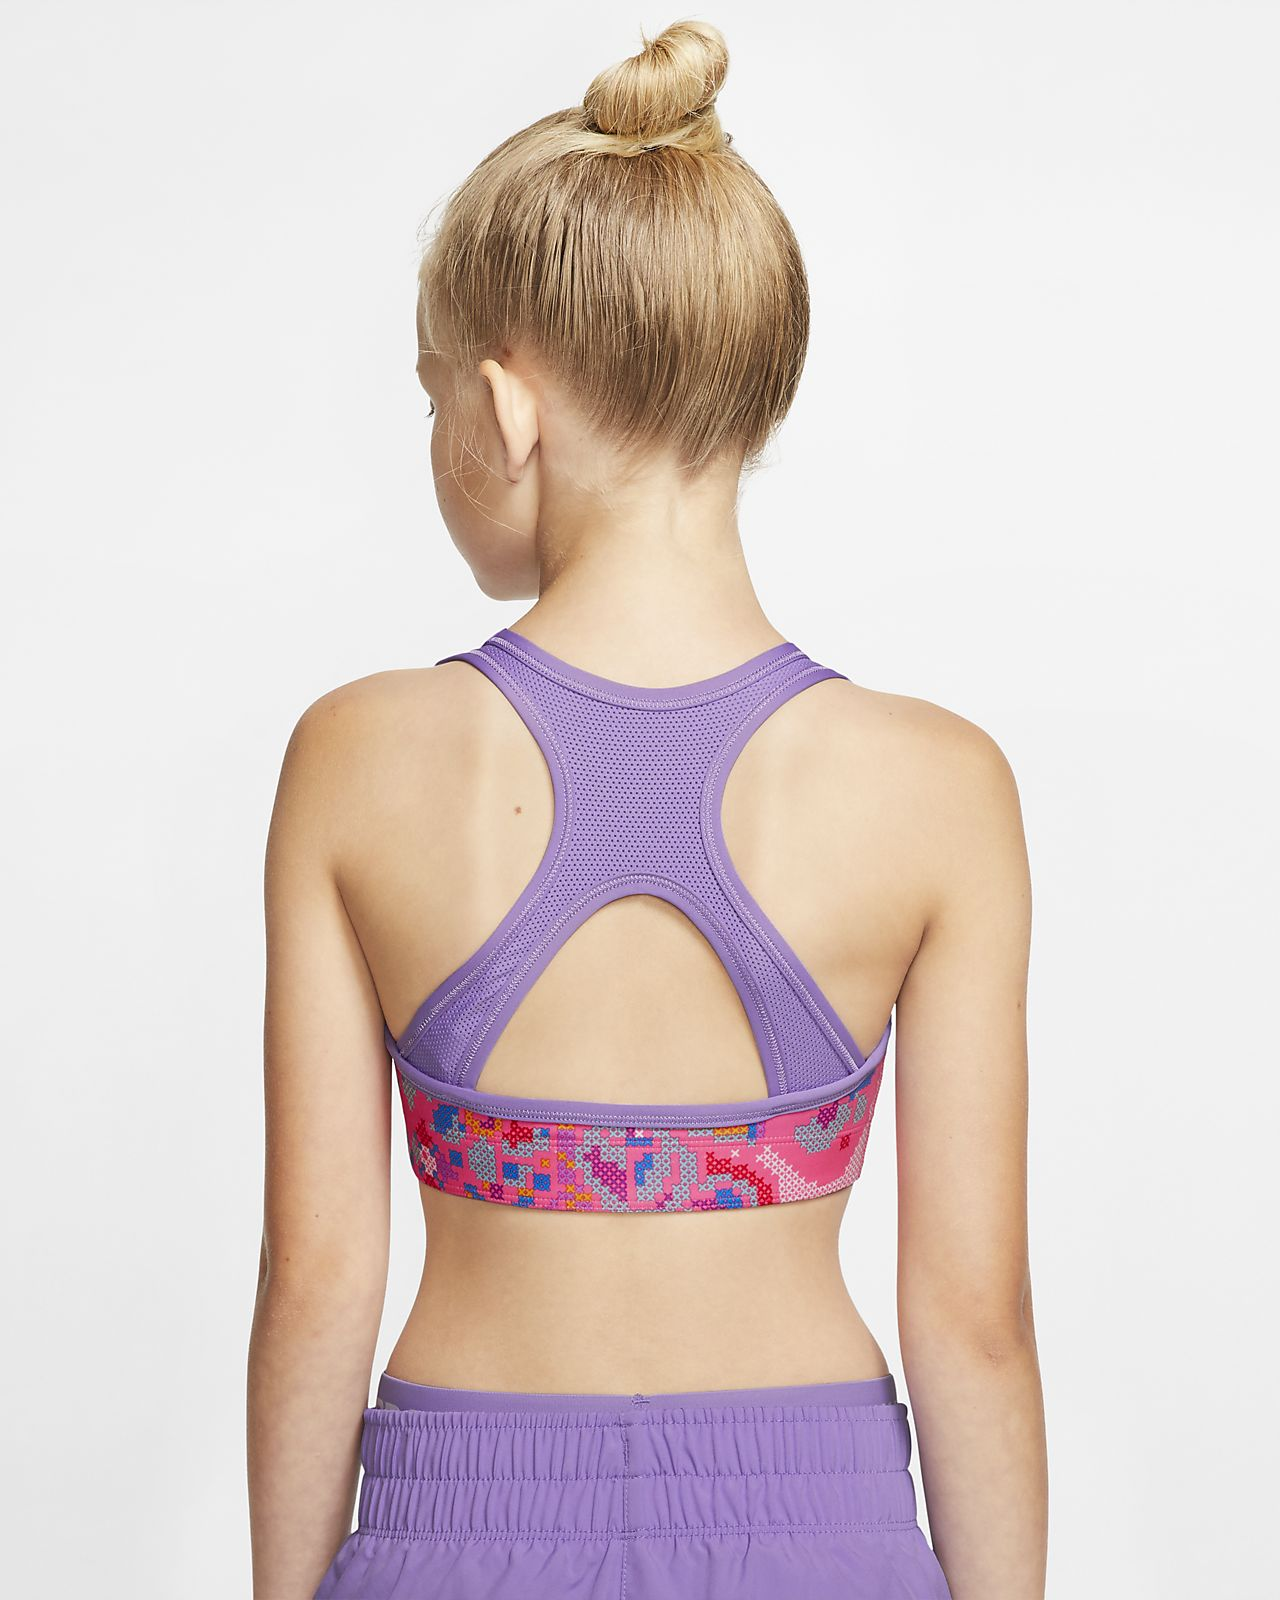 NIKE Girls Pro Dri-FIT Reversible Printed Sports Bra X-Small